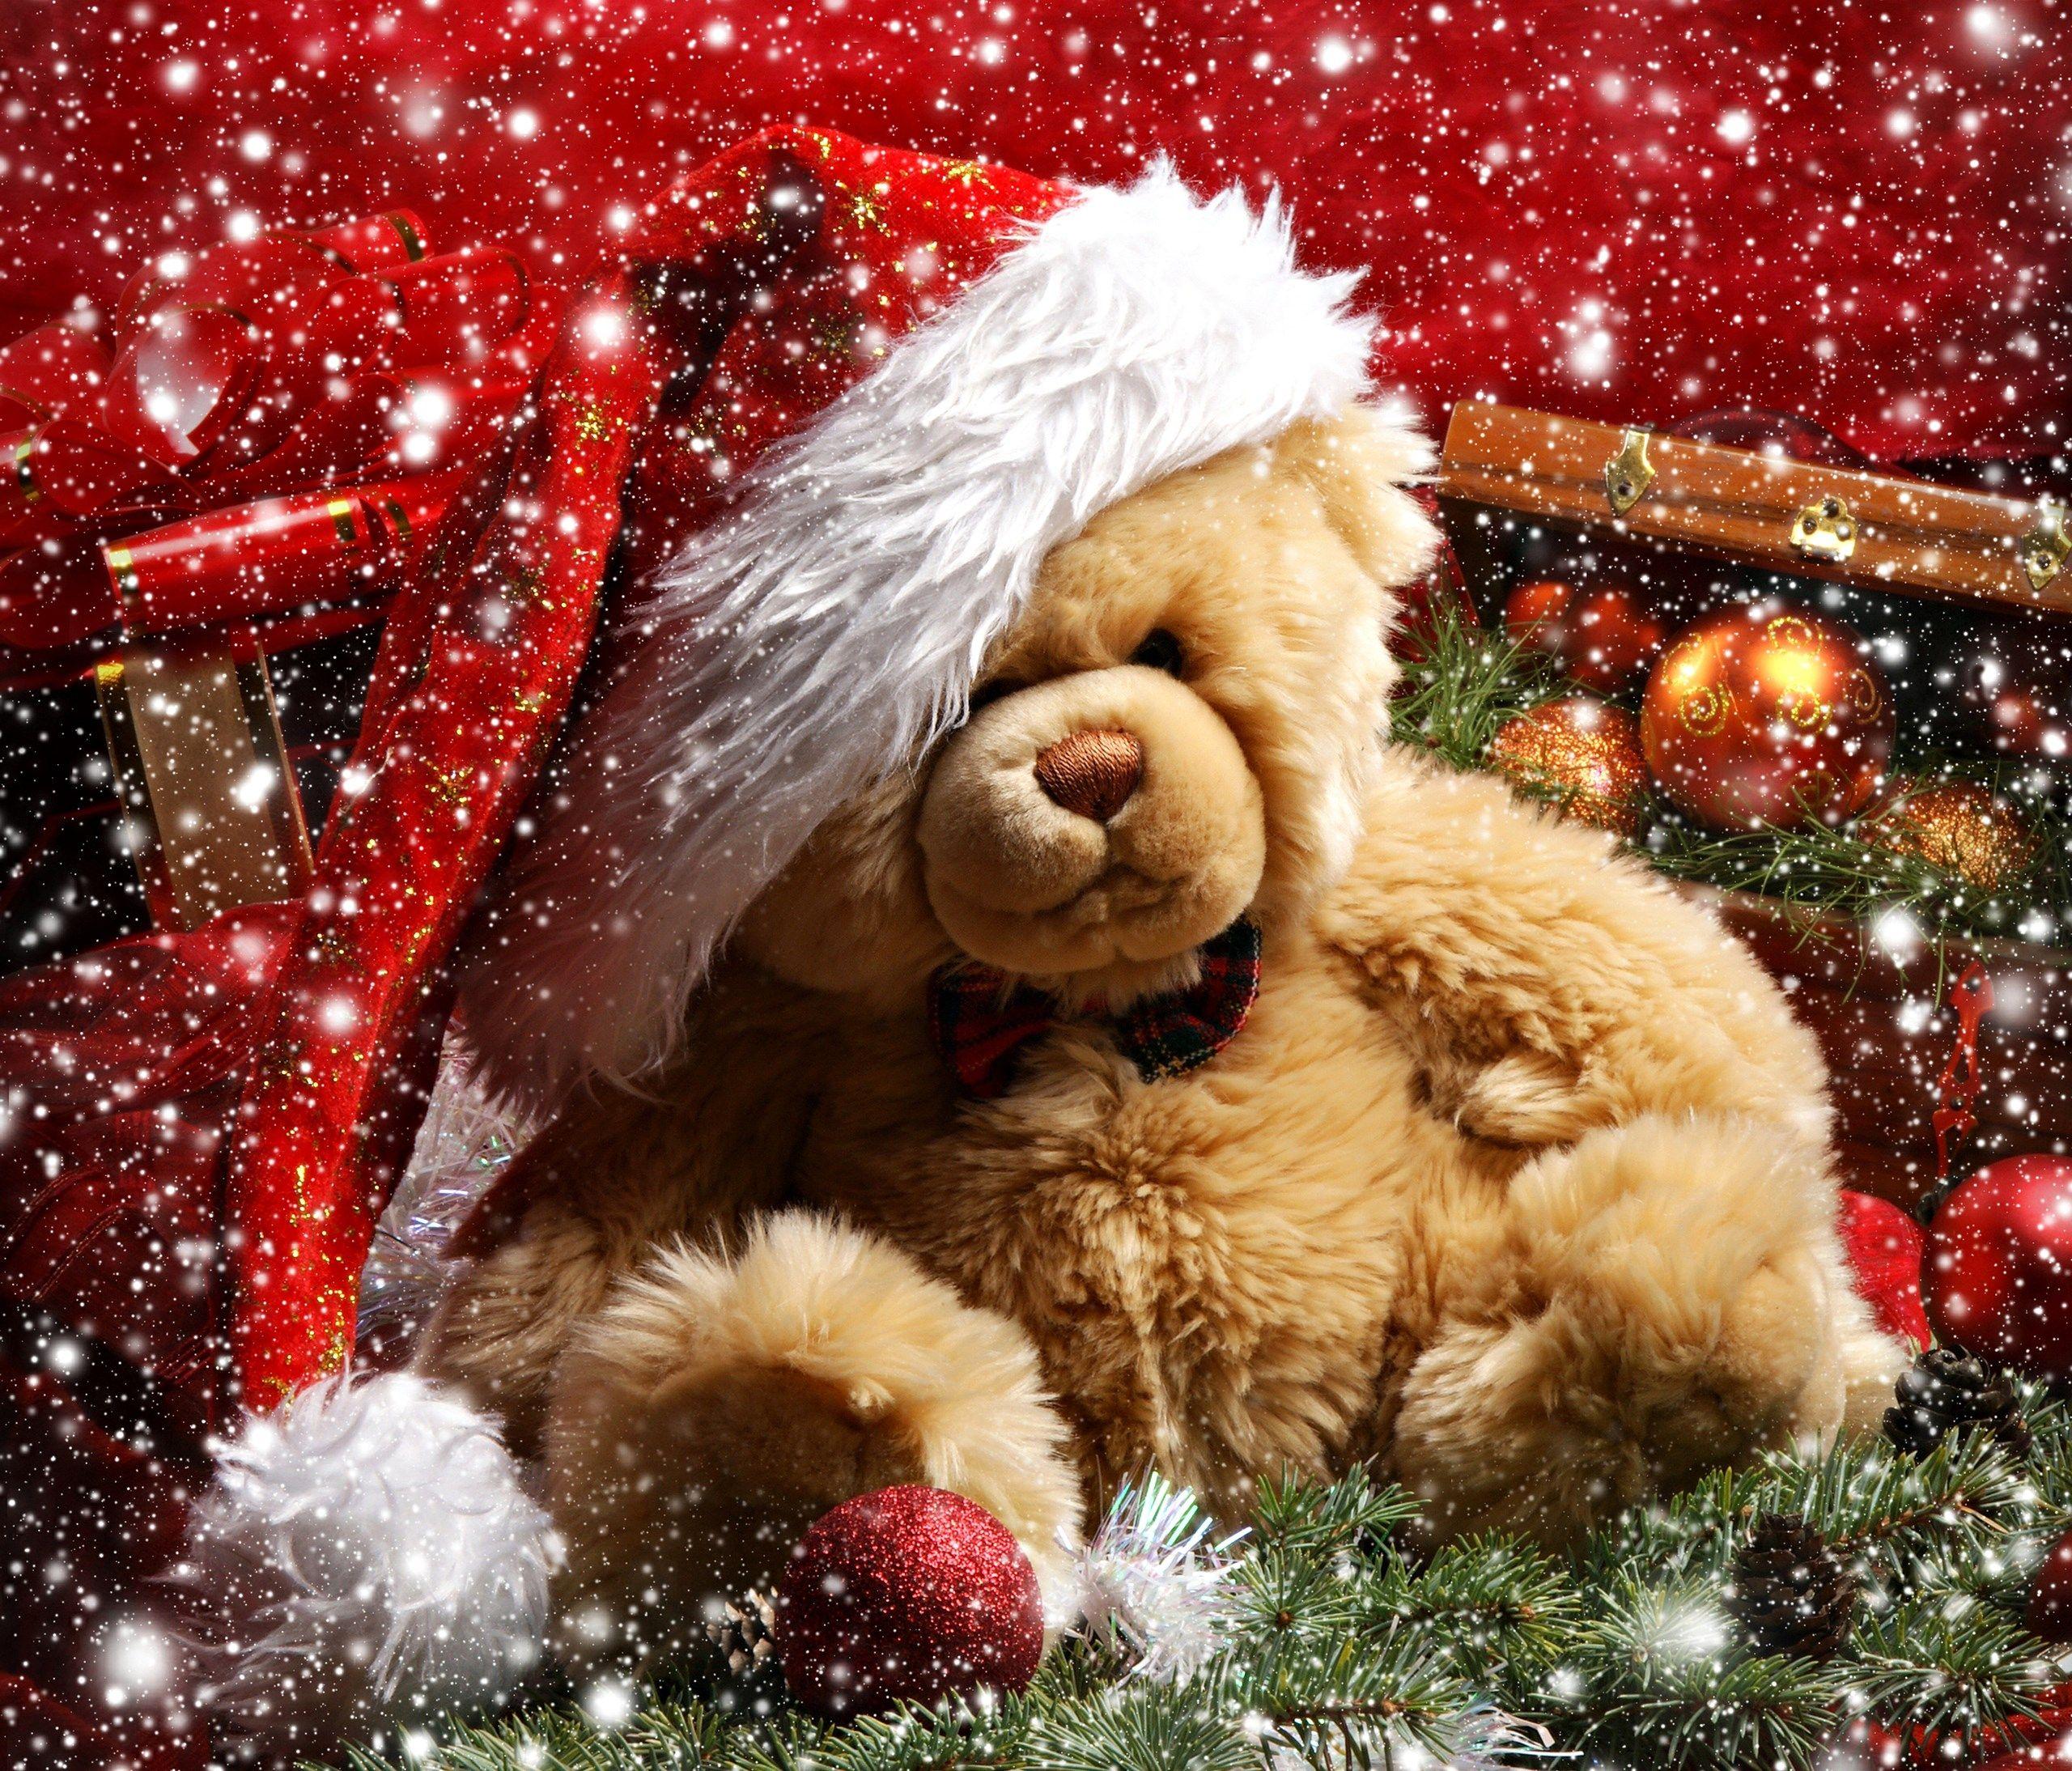 Free screensaver christmas image by Balduino Butler 2017 03 16